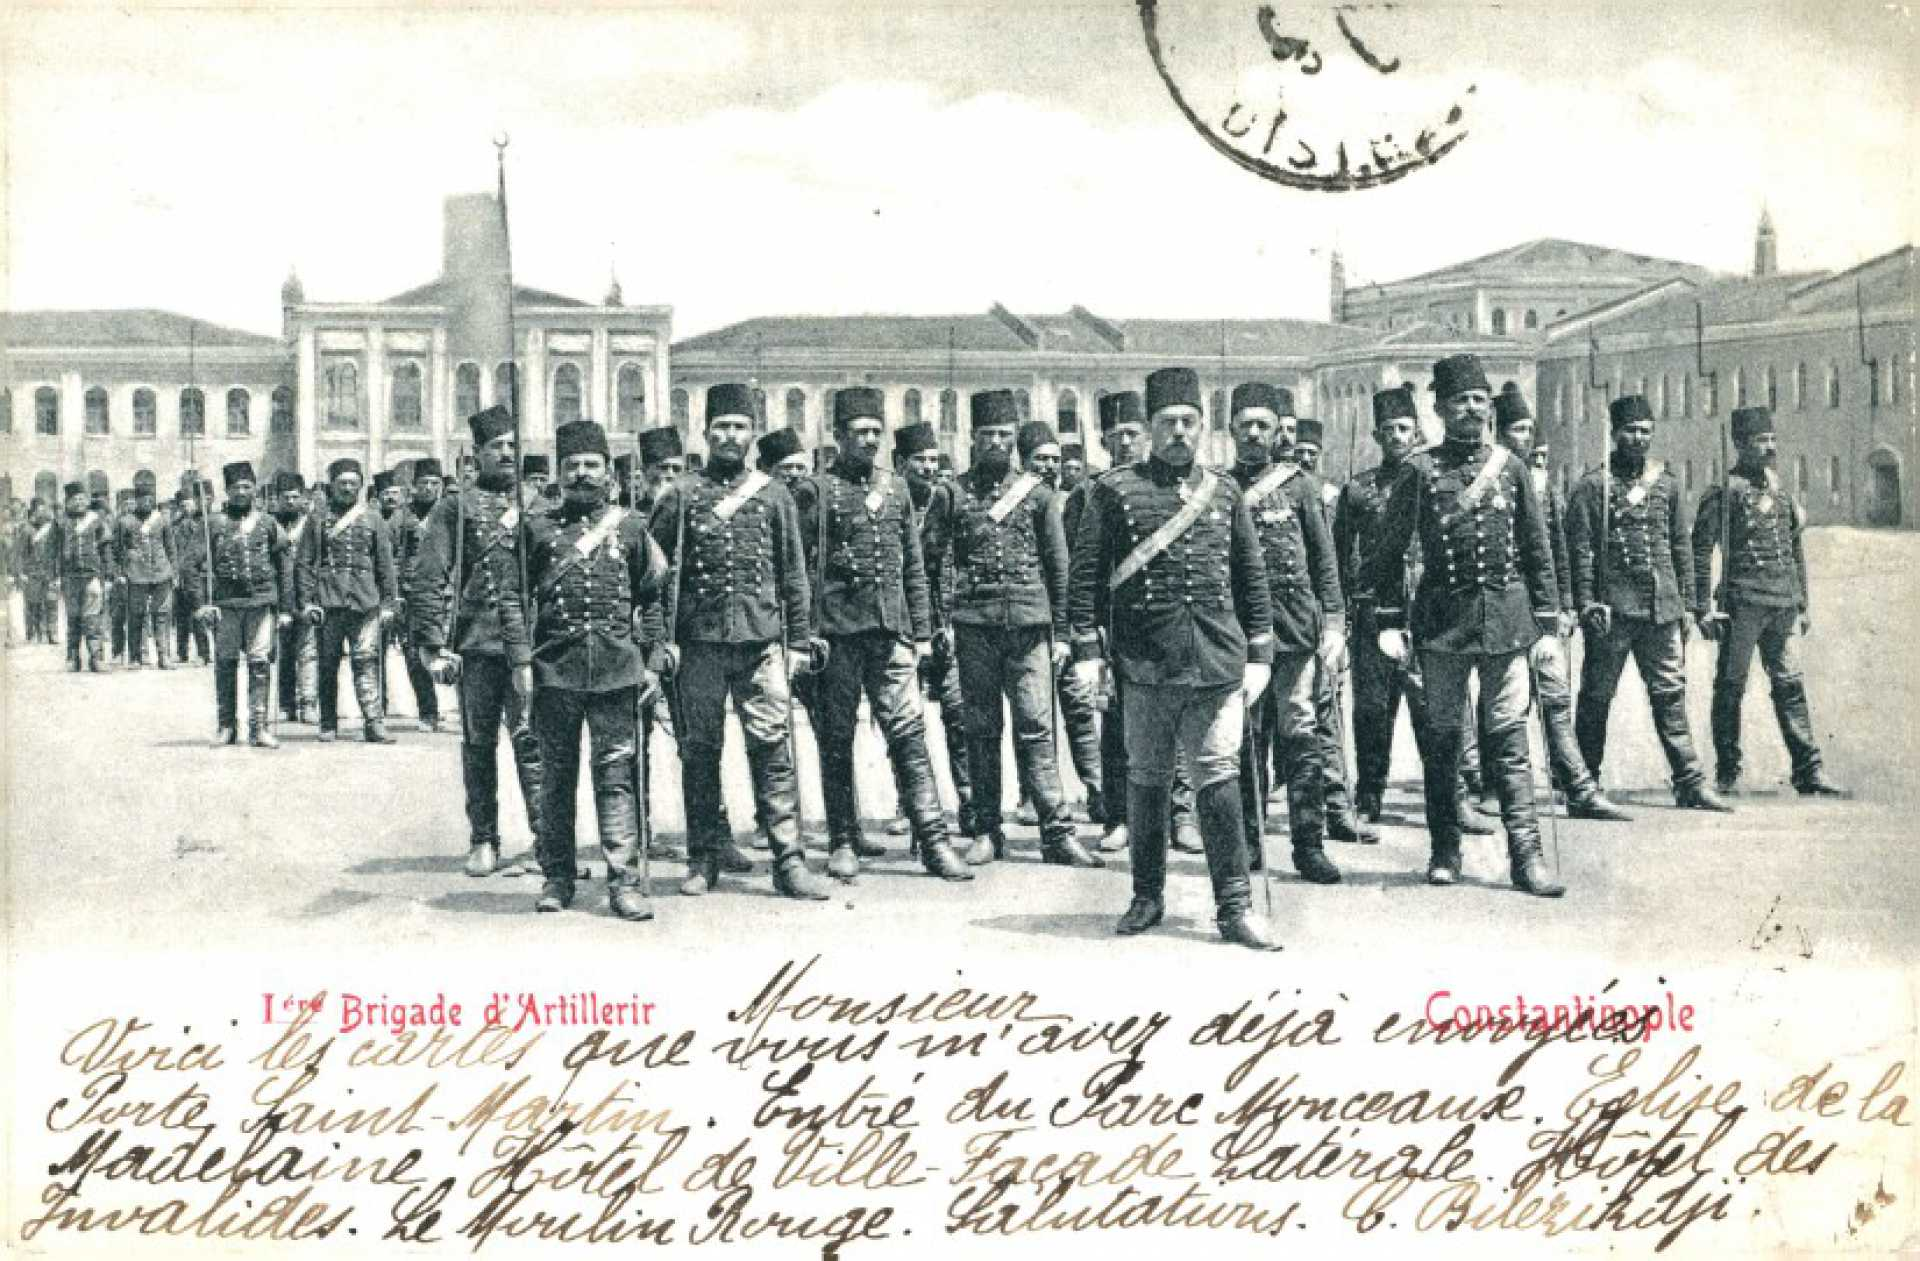 l ère Brigade d'Artillerie